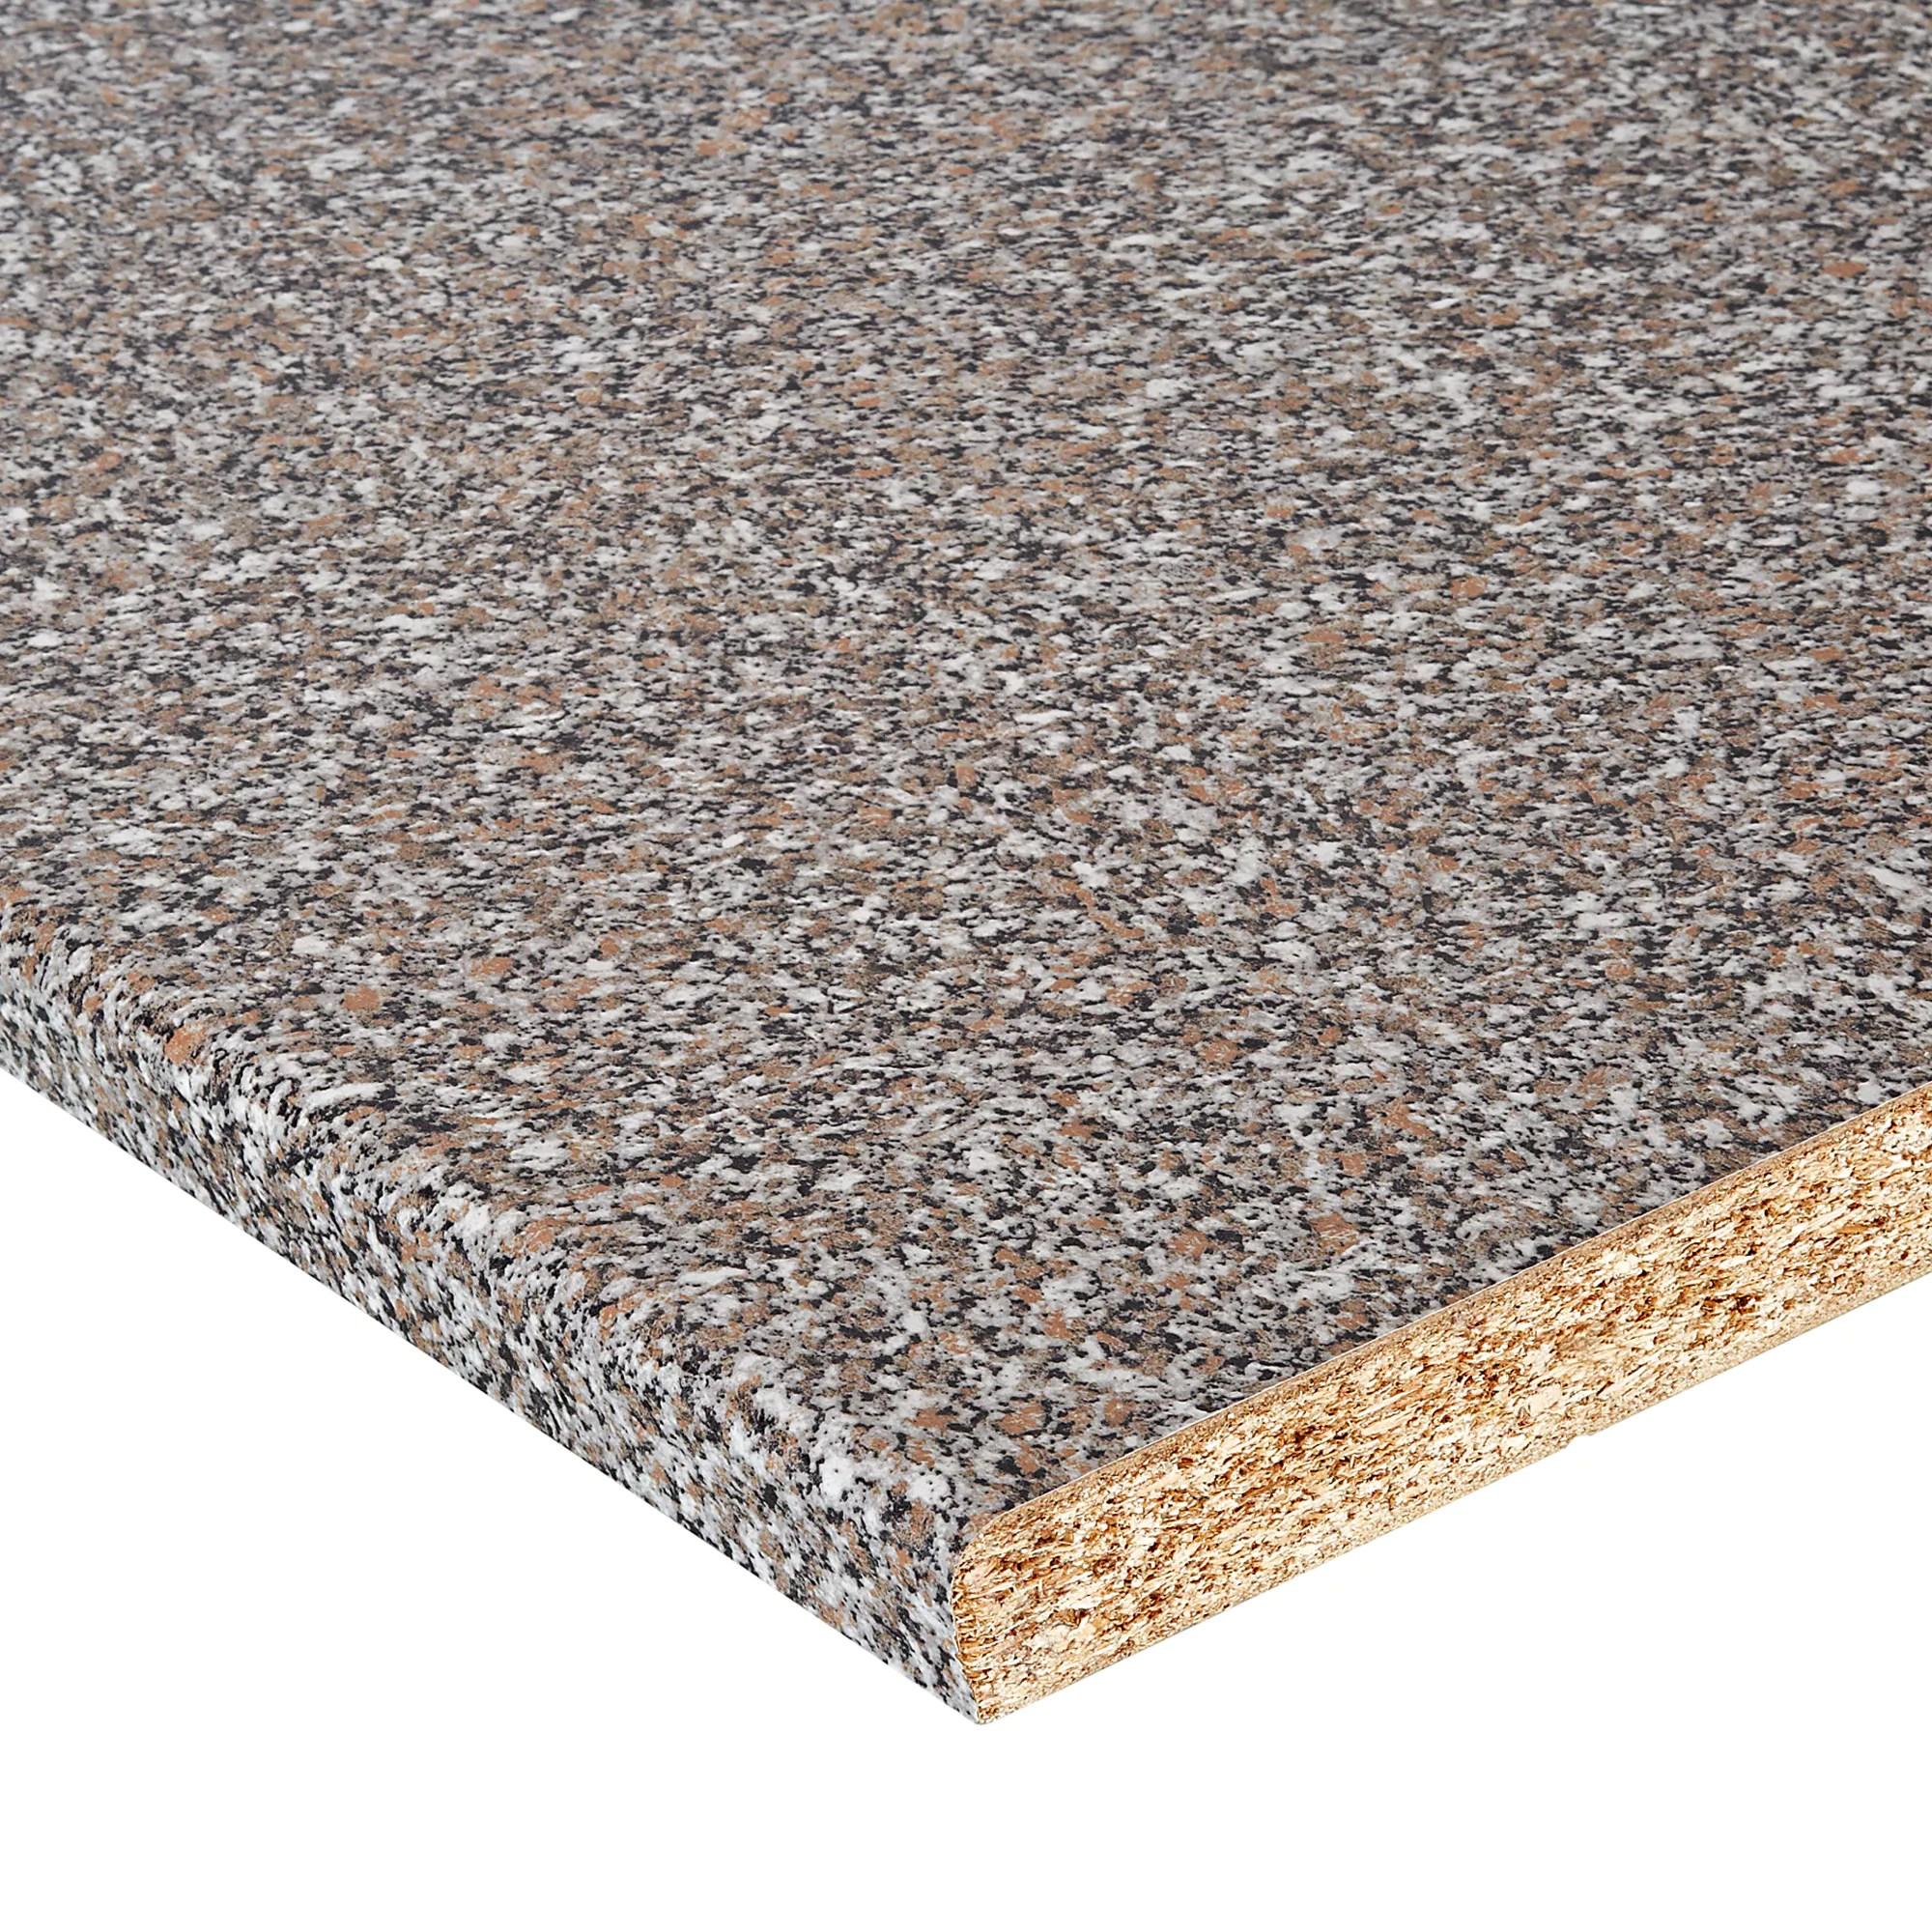 Arbeitsplatte kuche granit optik wotzccom for Arbeitsplatte granit